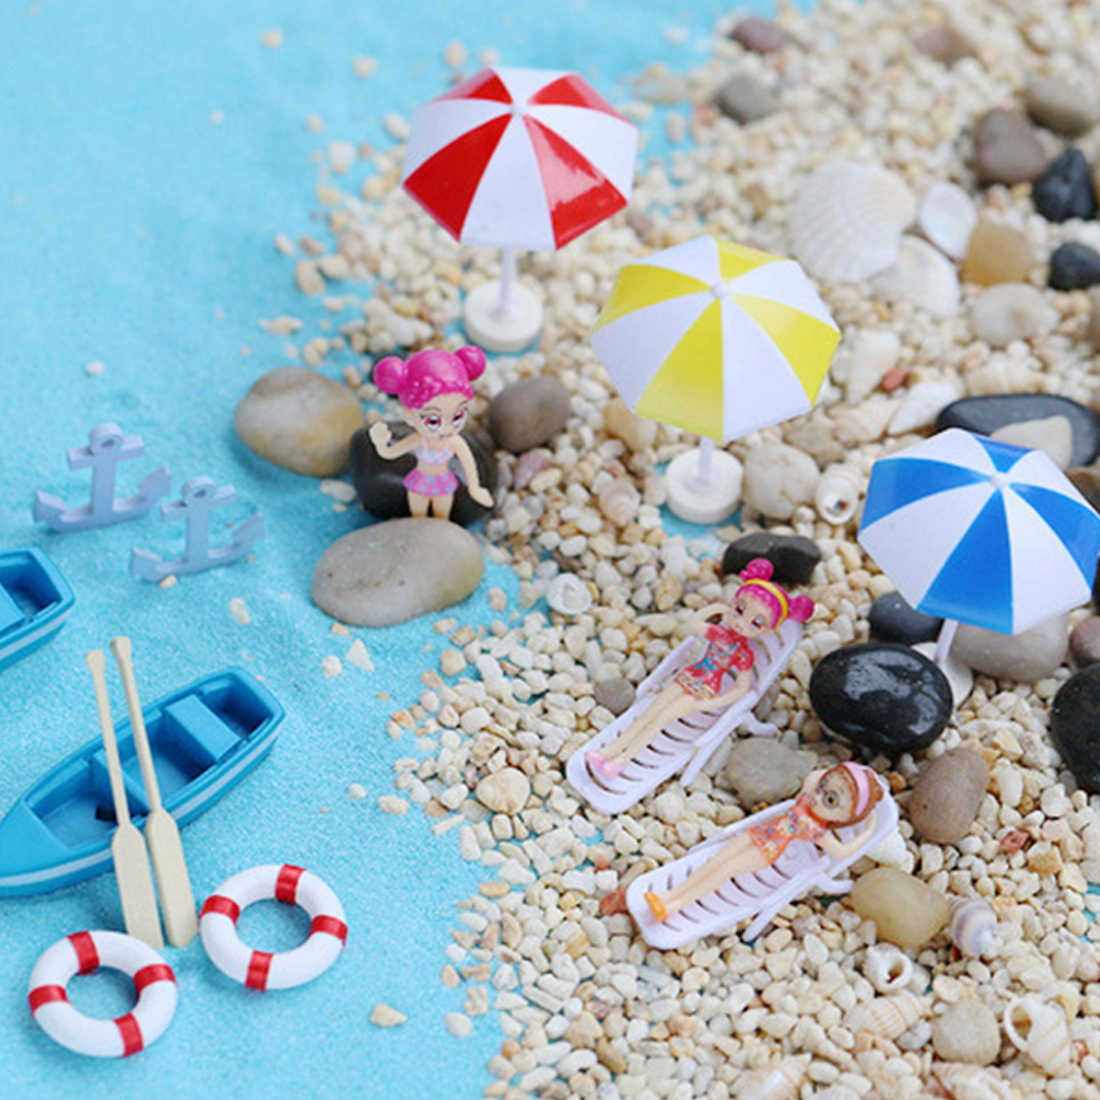 Mini Artificial Beach Chair Bench Micro Fairy Garden Figurine Miniature/Terrarium/Doll House Decoration Ornament DIY Accessories